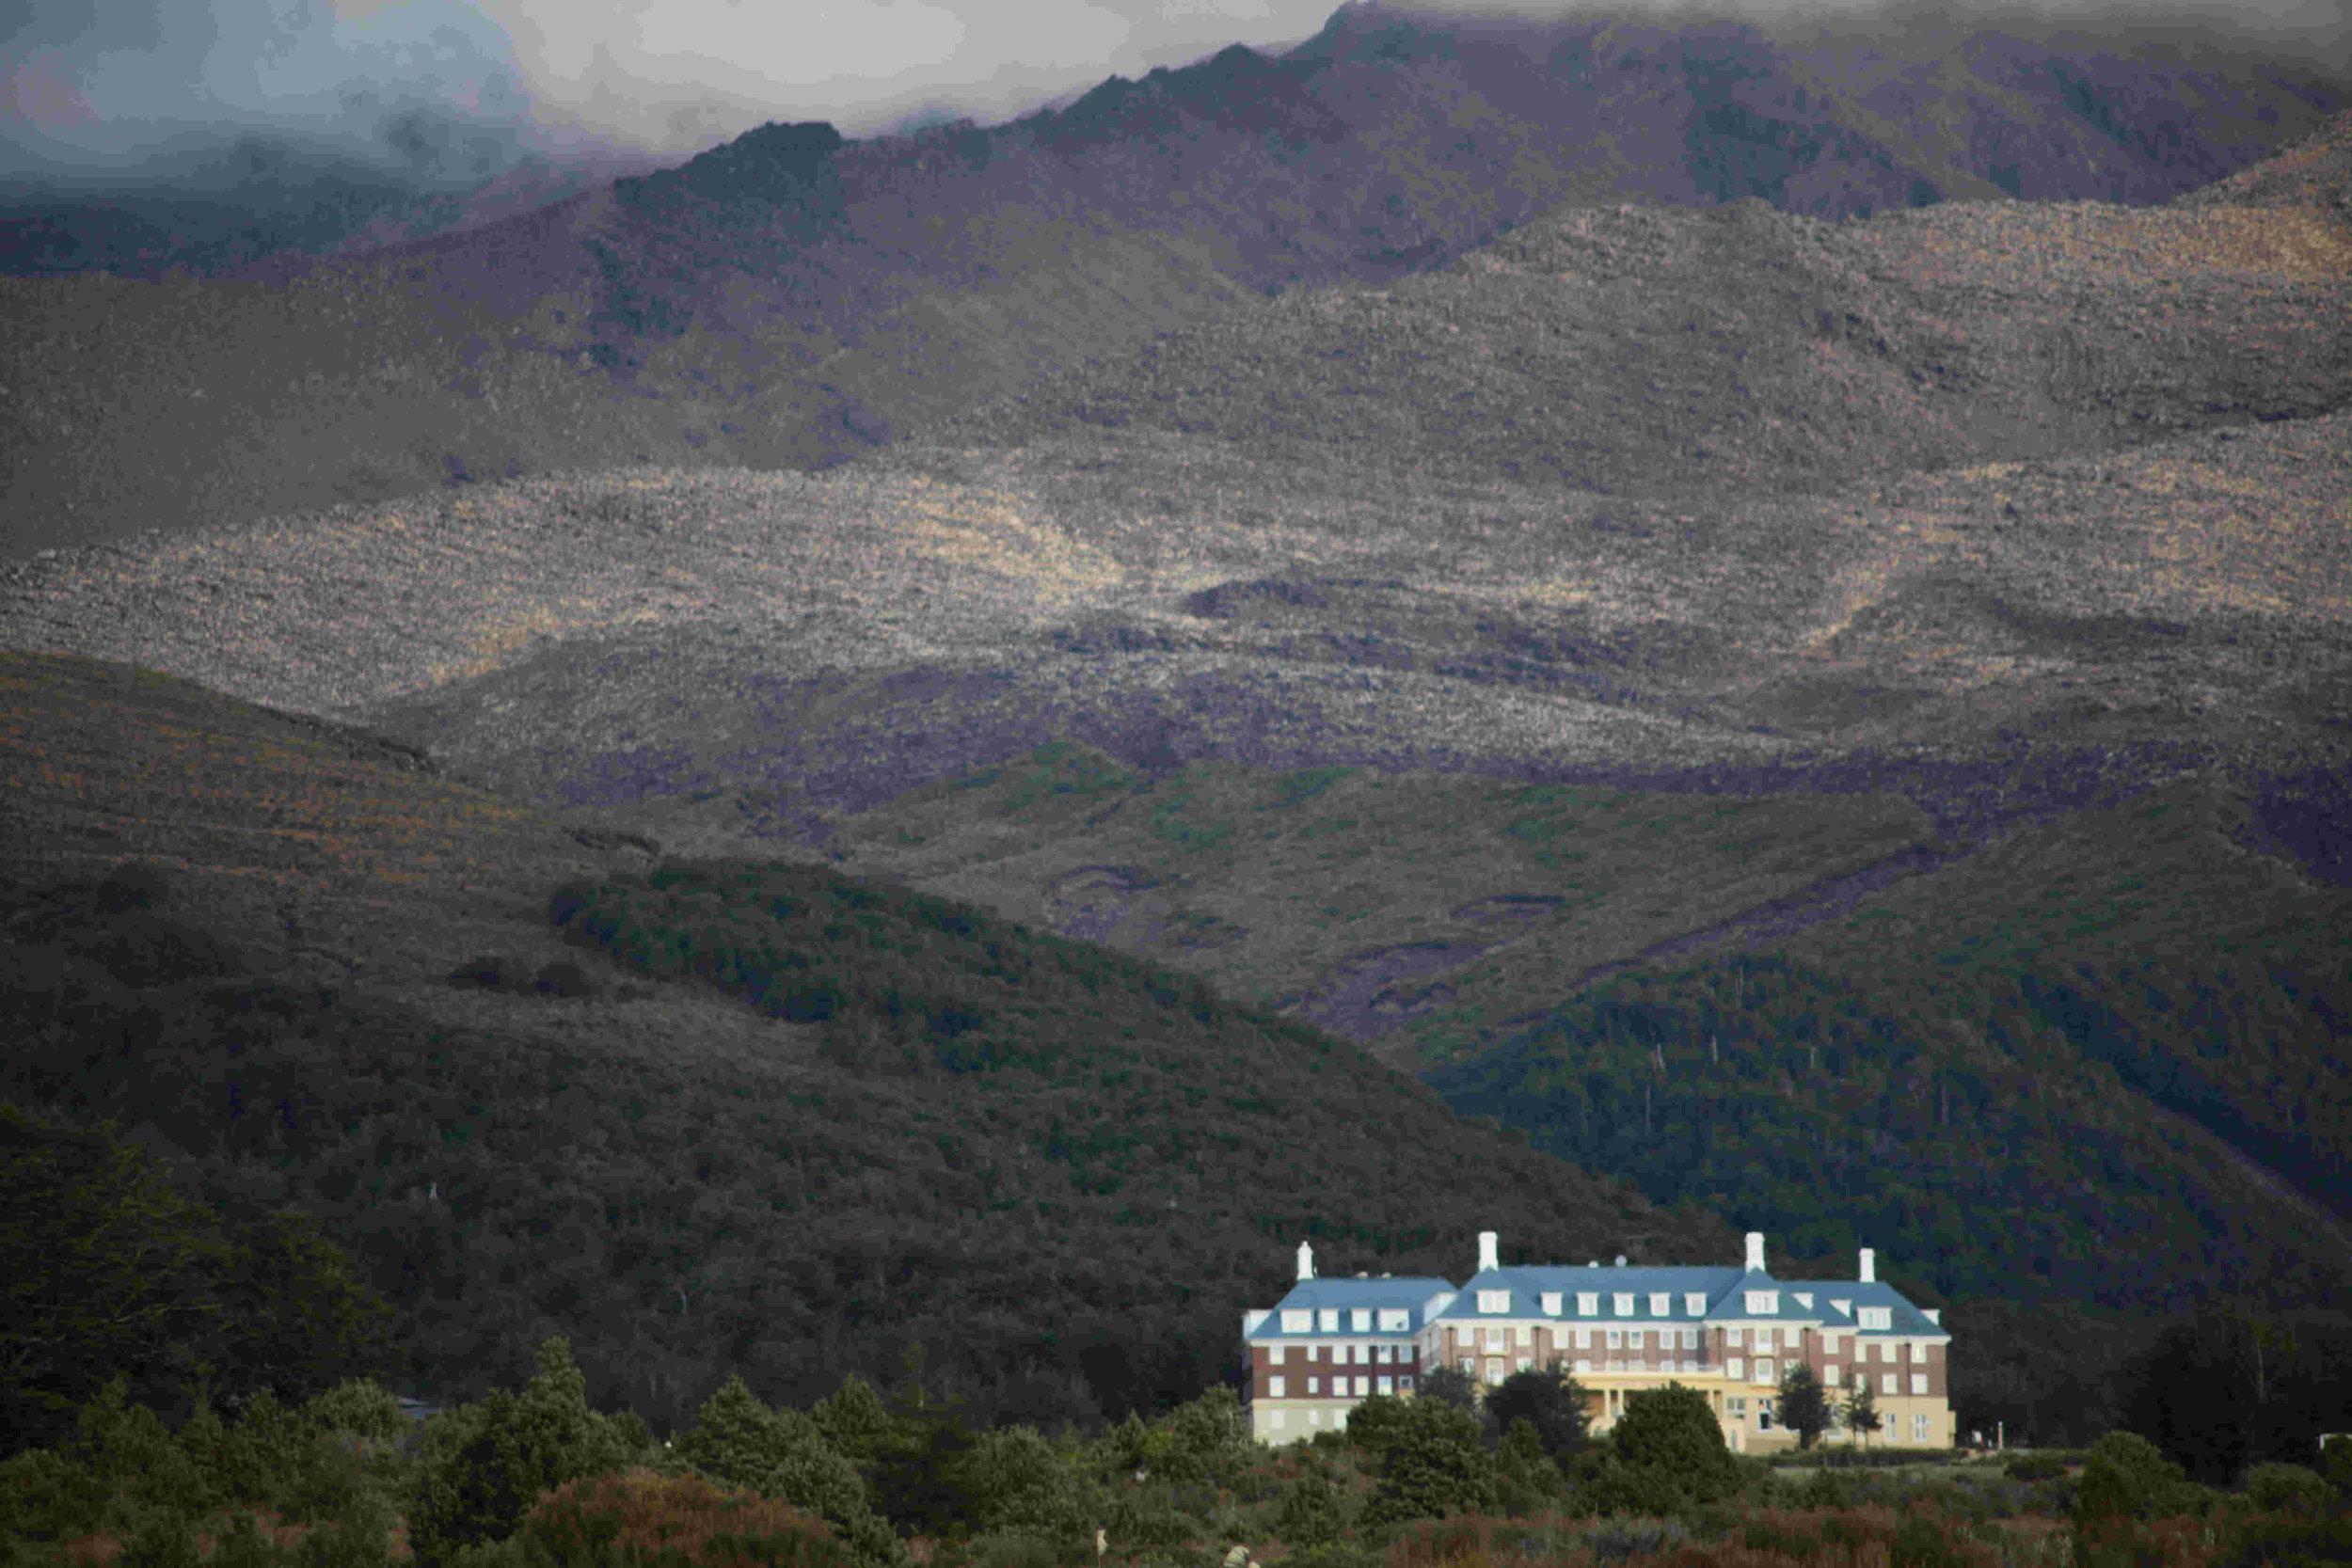 New Zealand mountain hotel